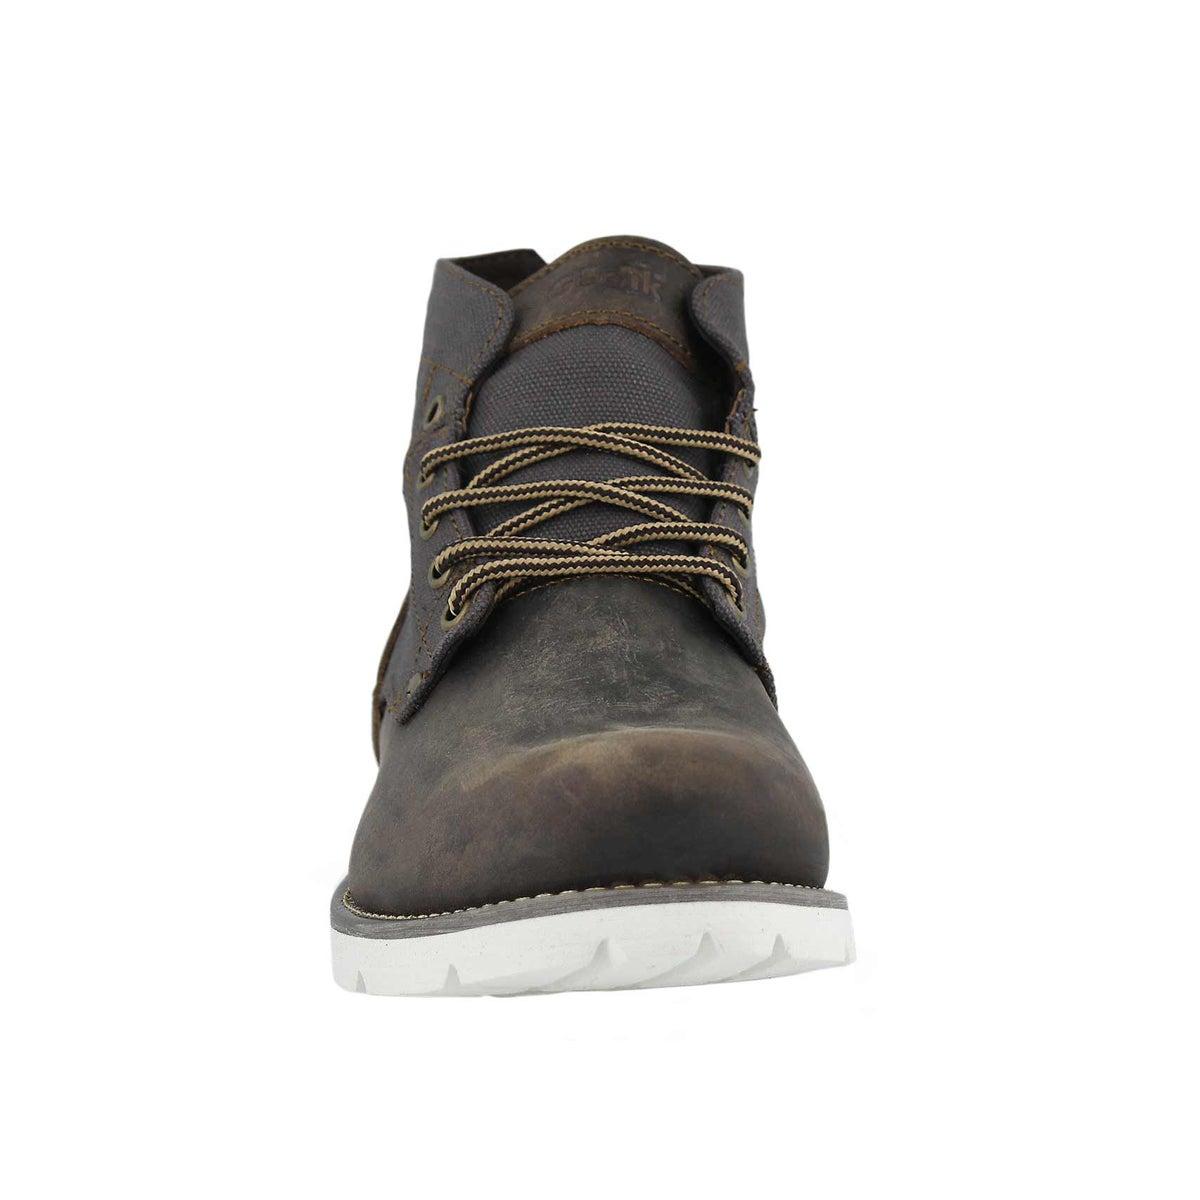 Mns Gavin brn/gry wtrpf winter boot